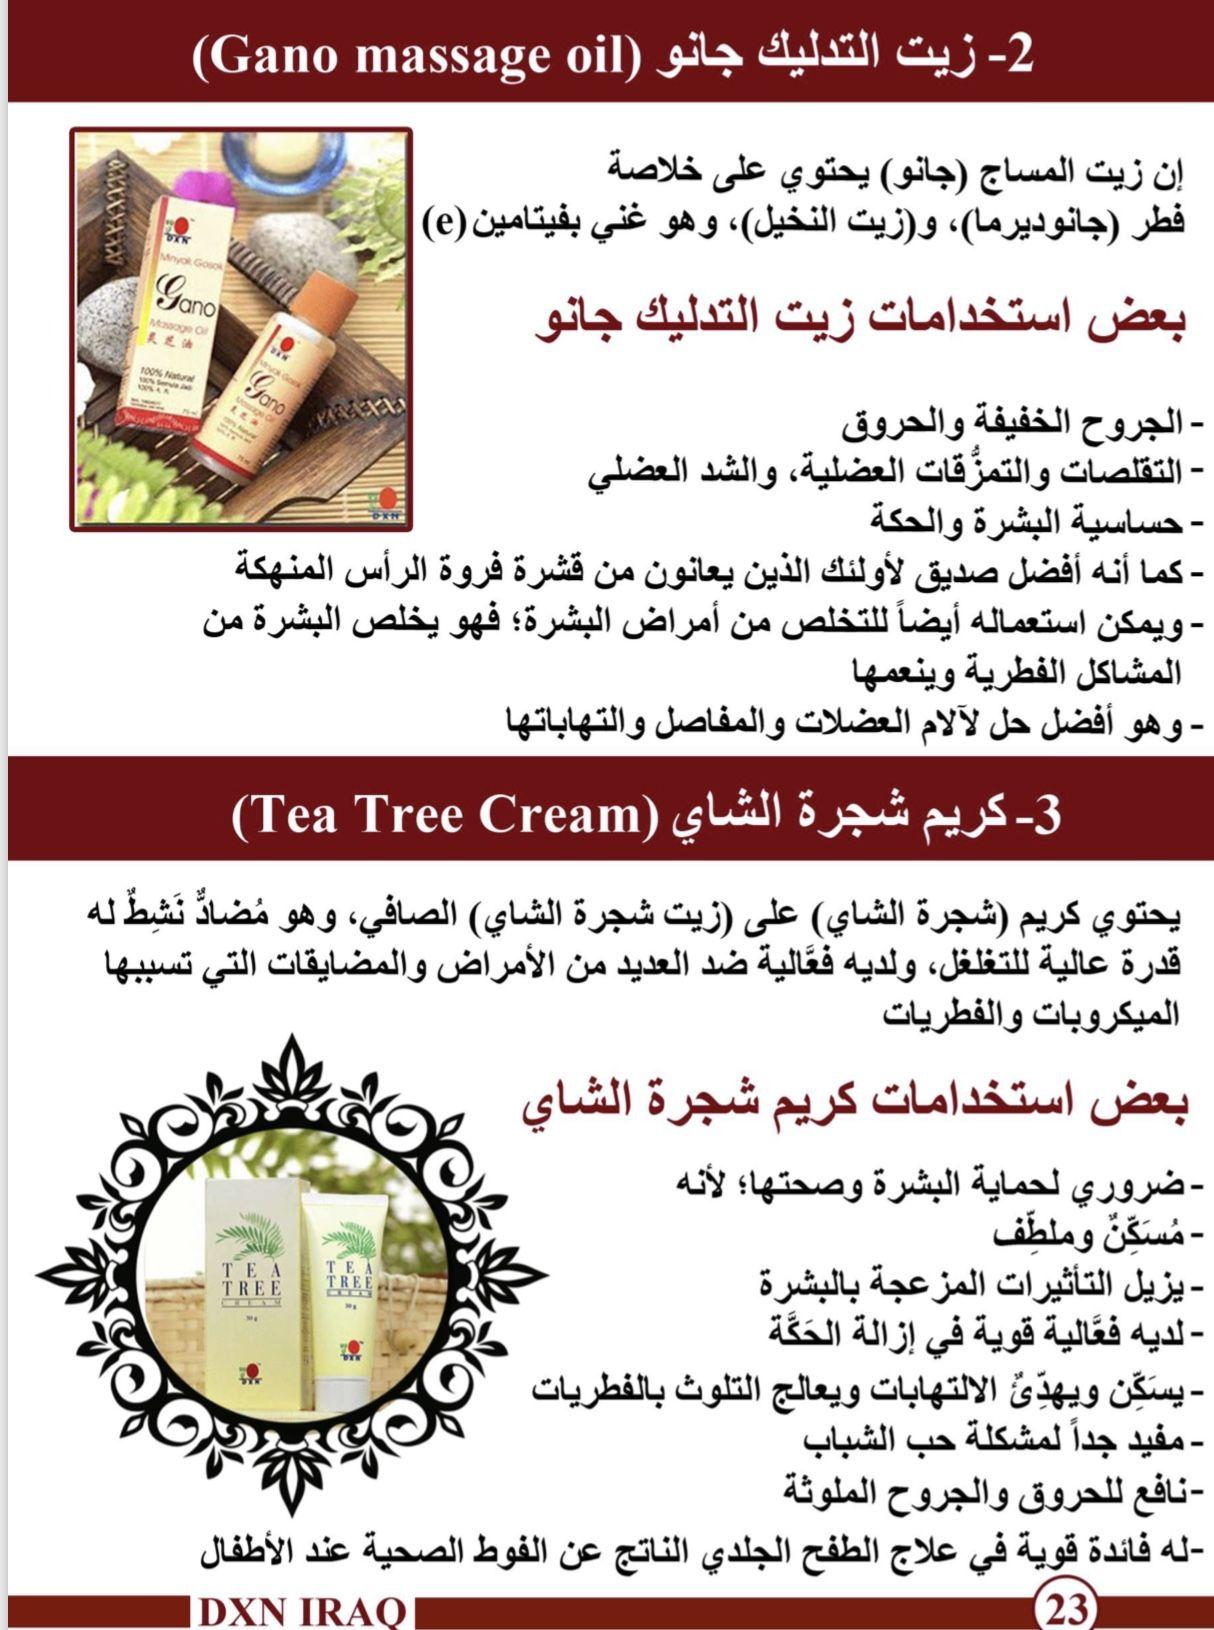 Pin By Smo On Haifa Massage Oil Oils Coding